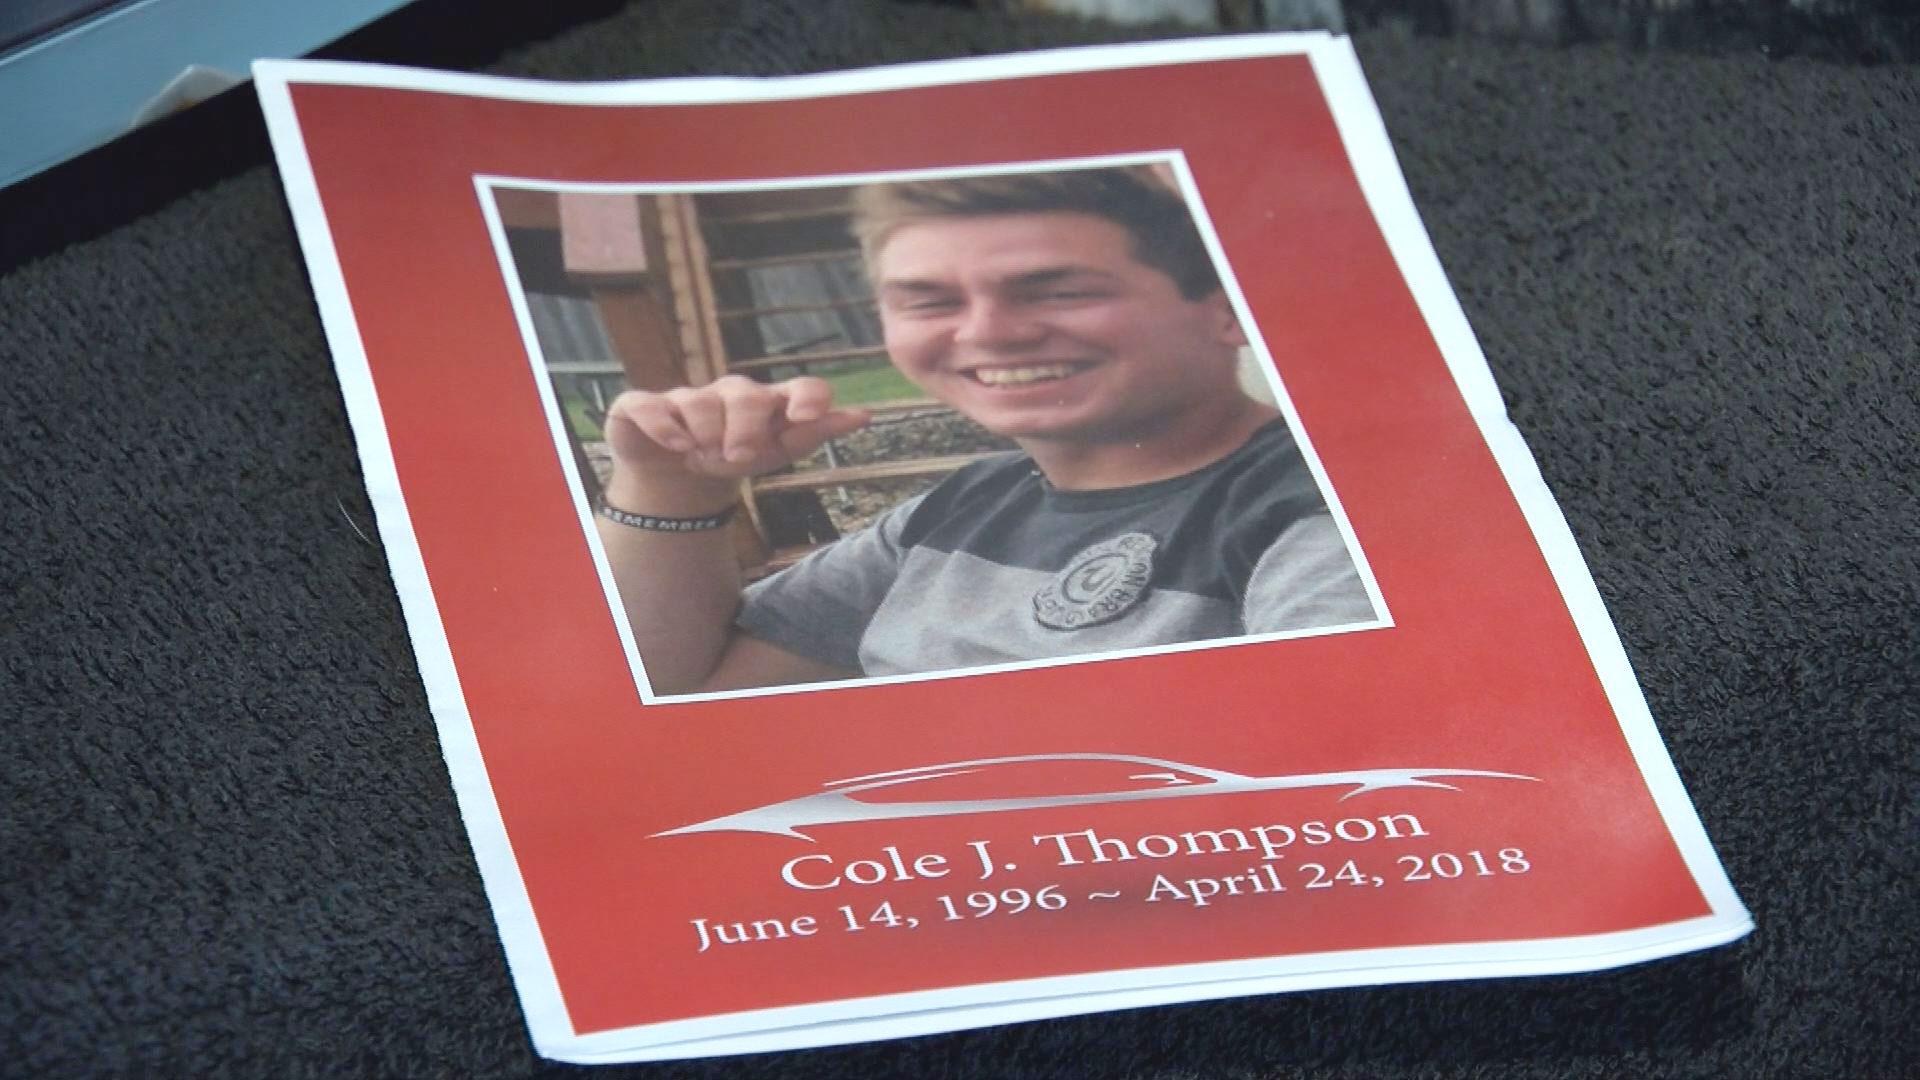 KELO Cole Thompson